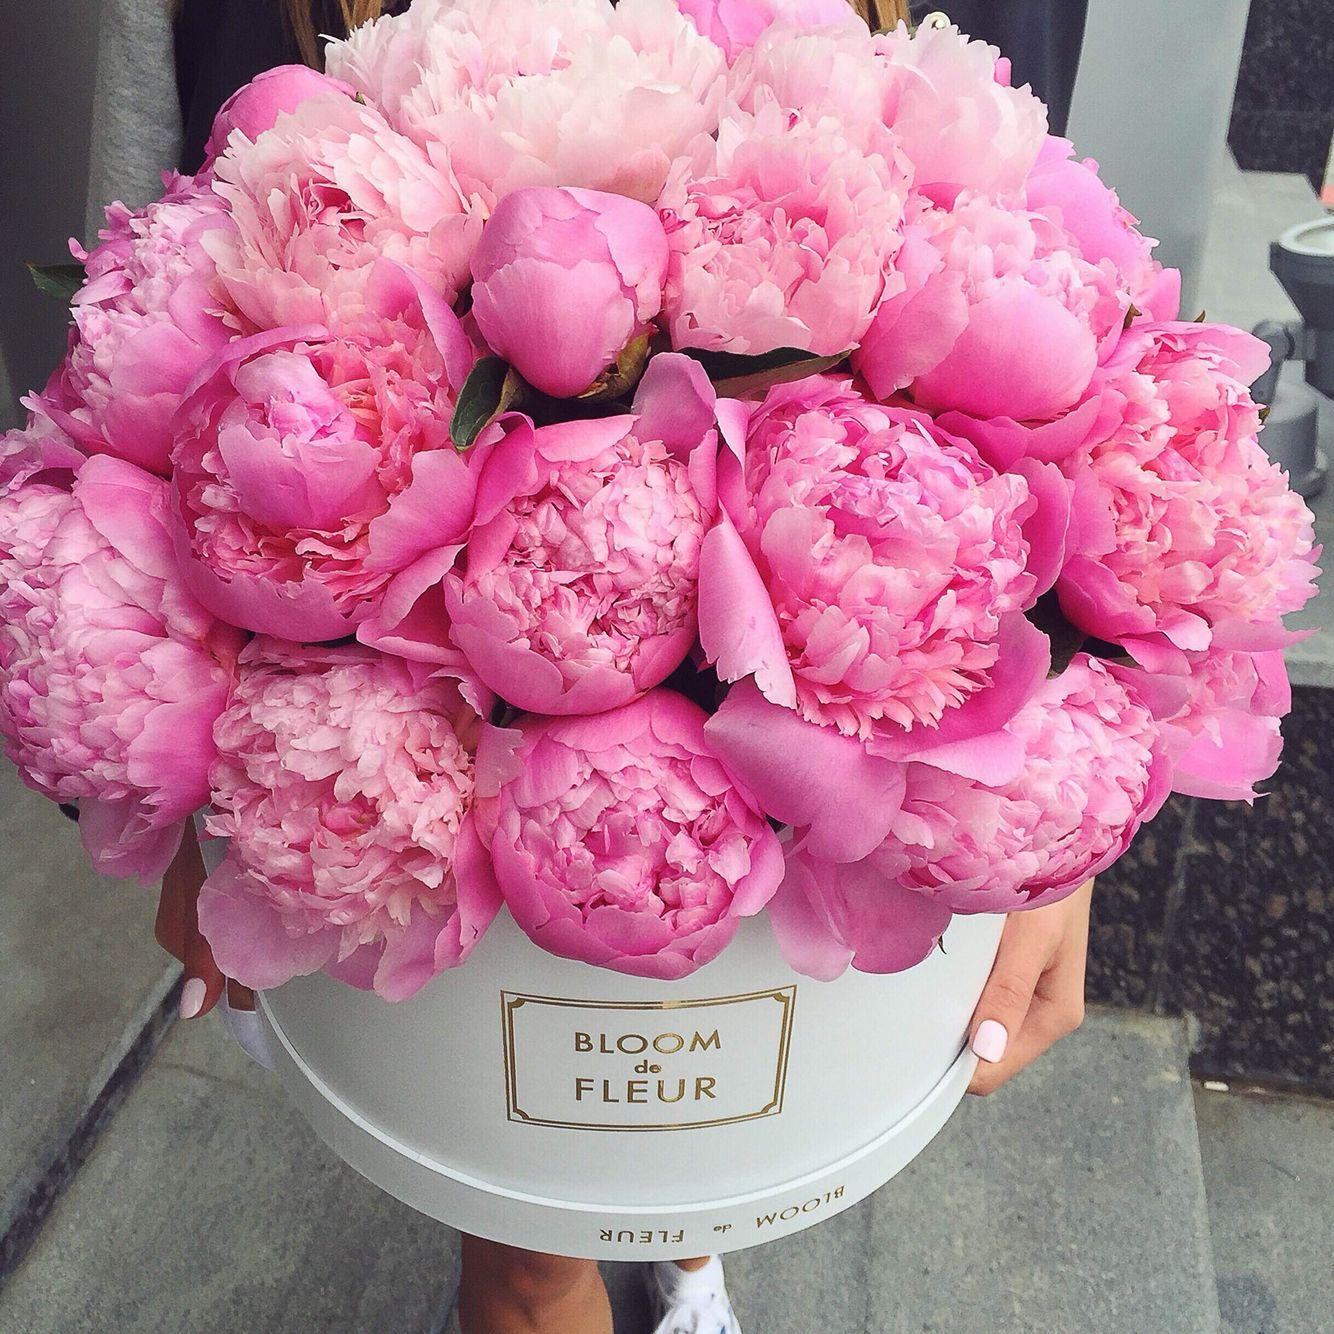 Look at these peonies just look bloom pinterest peony peonies are just the prettiest flowers dhlflorist Images